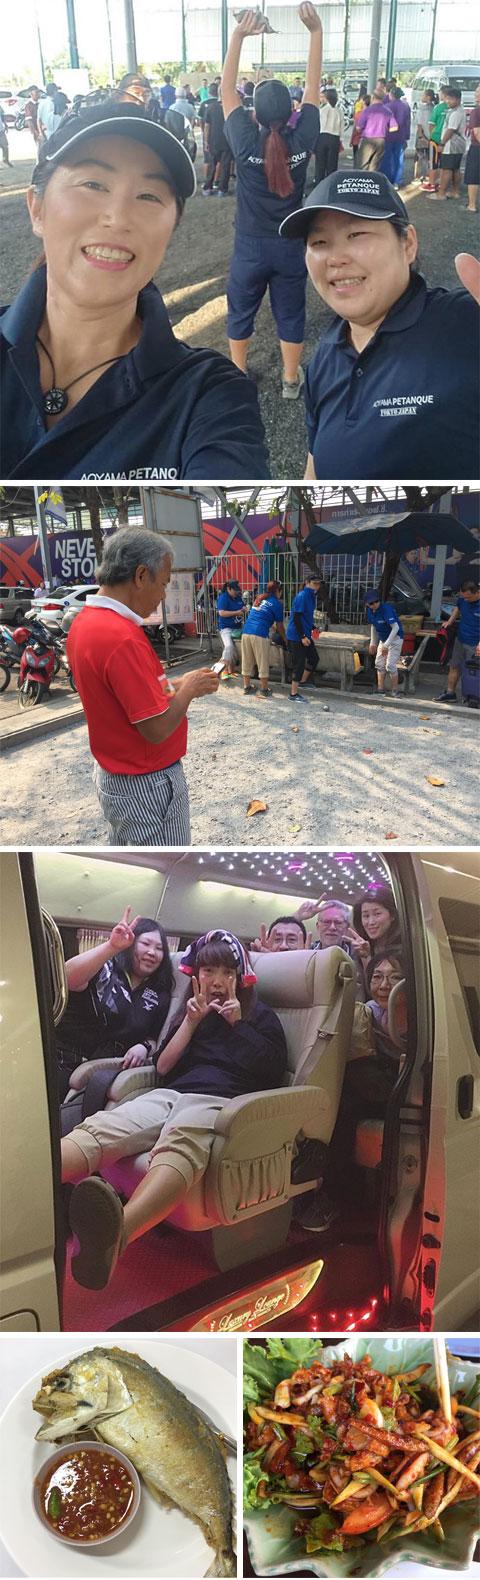 2019 Aoyama Petanque in Bangkok Petanque Food Fun